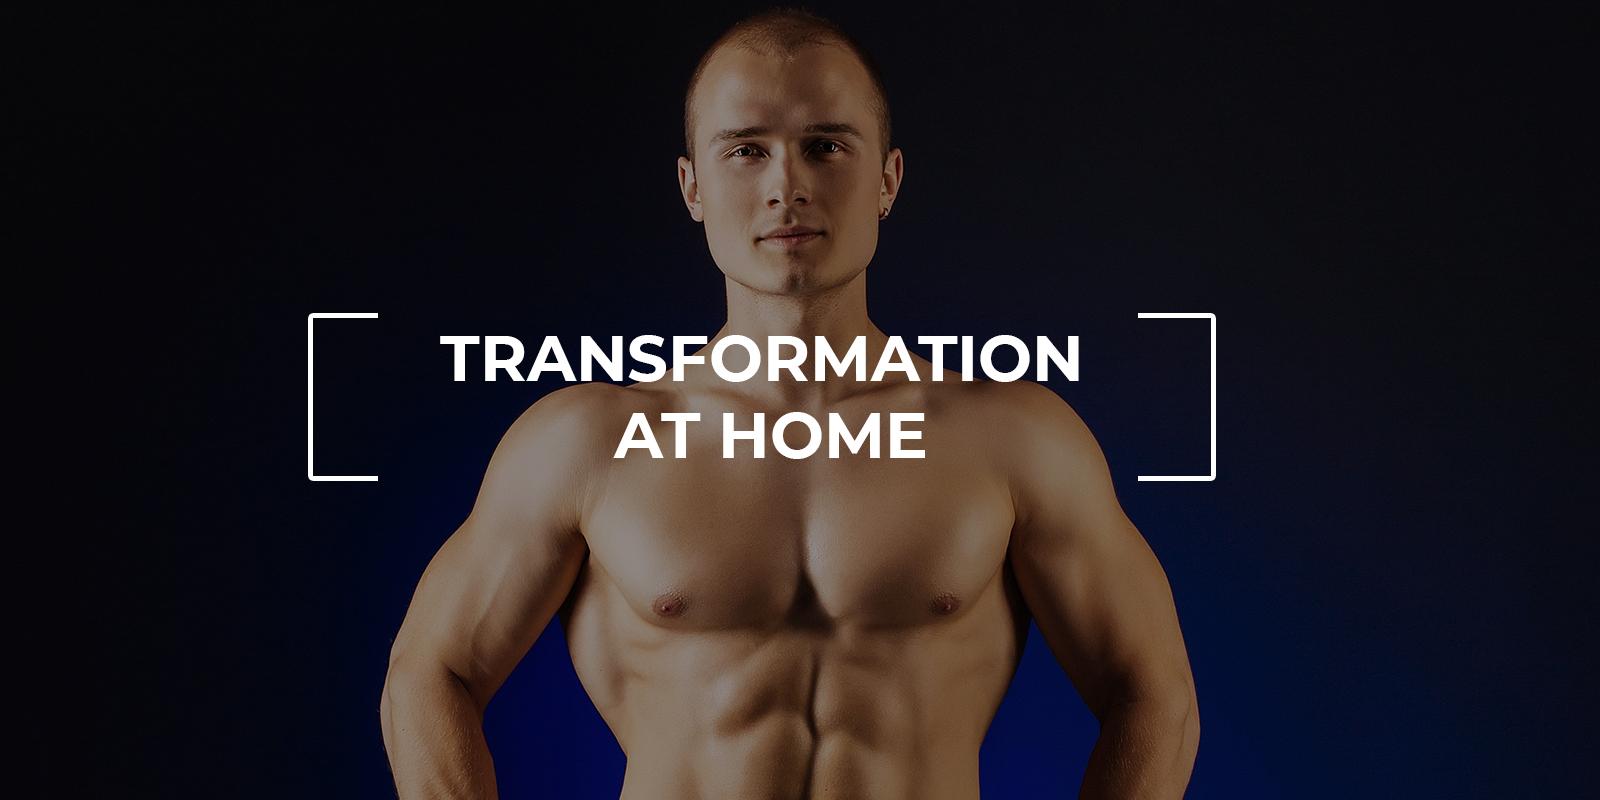 Transformation At Home